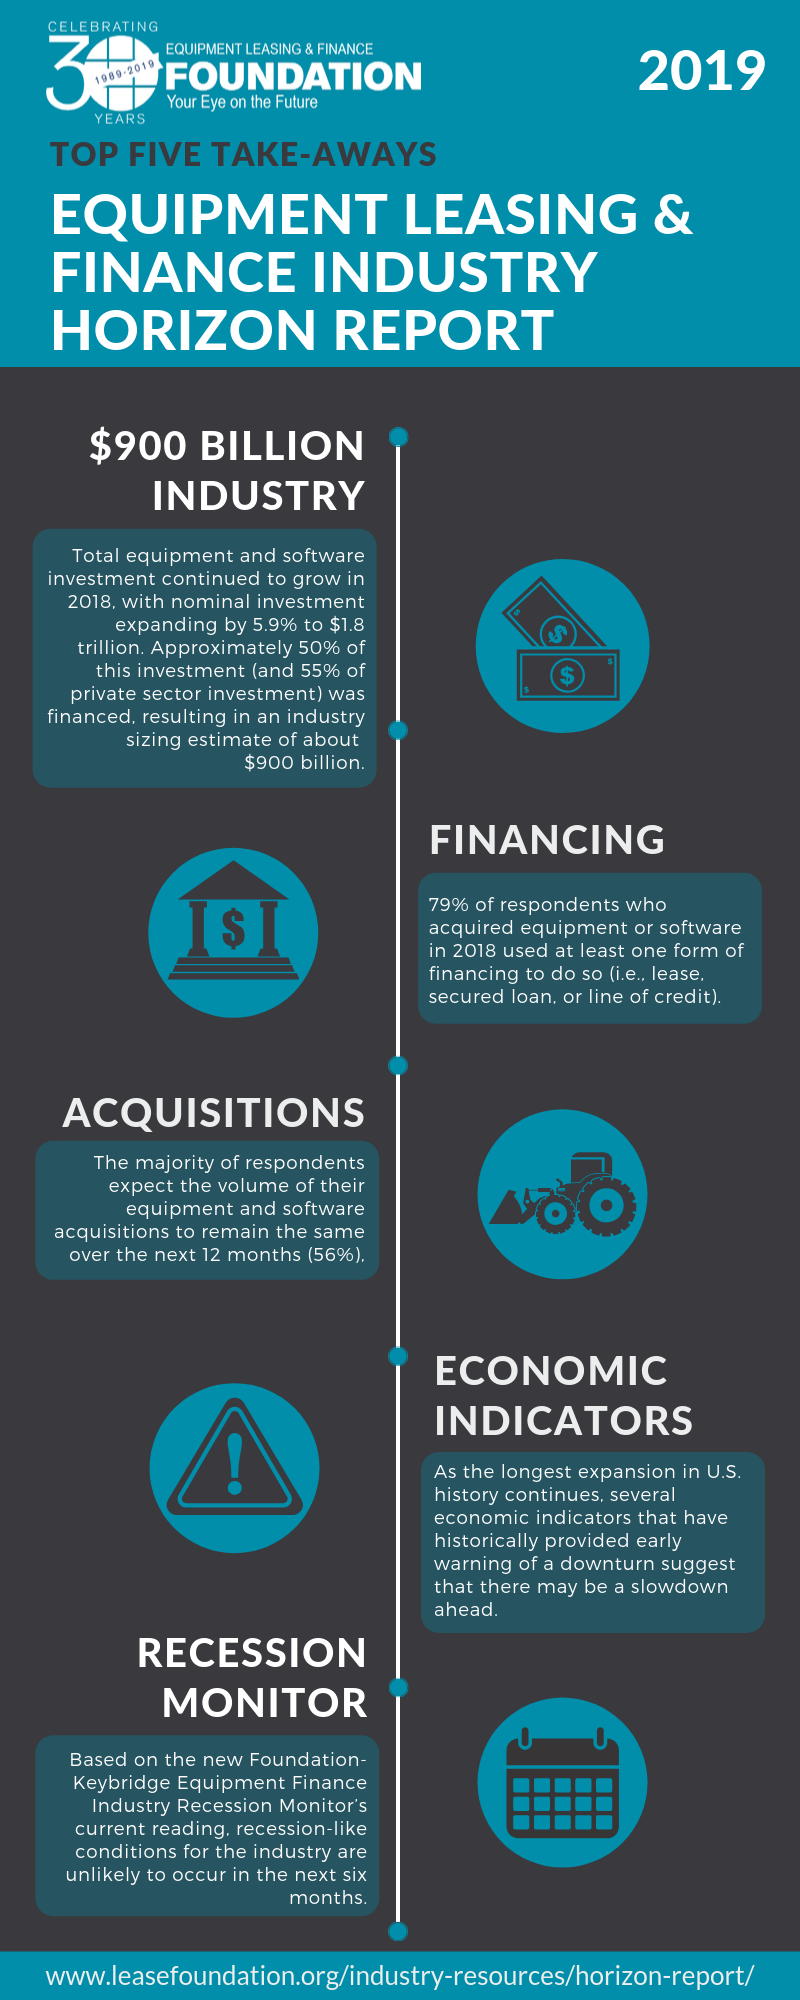 2019 Horizon Report Infographic